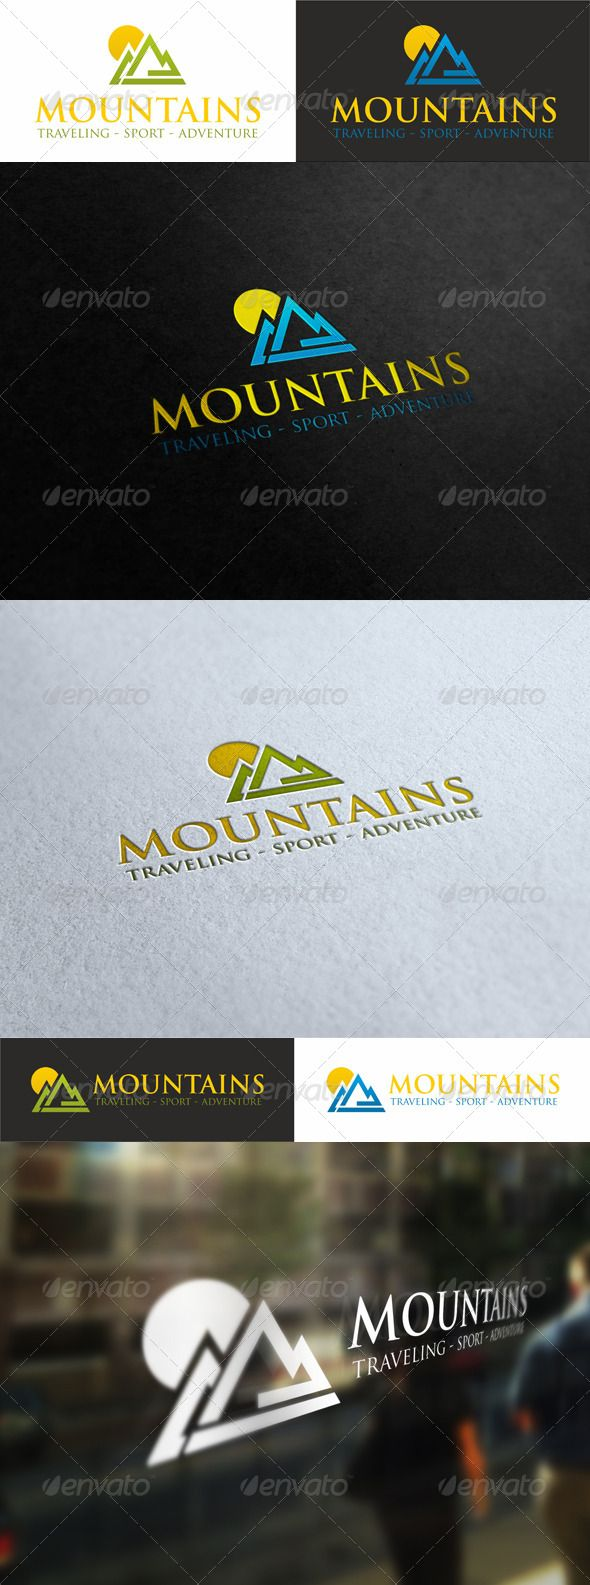 Sunny Mountains Traveling Sport Logo Sports Logo Green Logo Design Elegant Logo Design